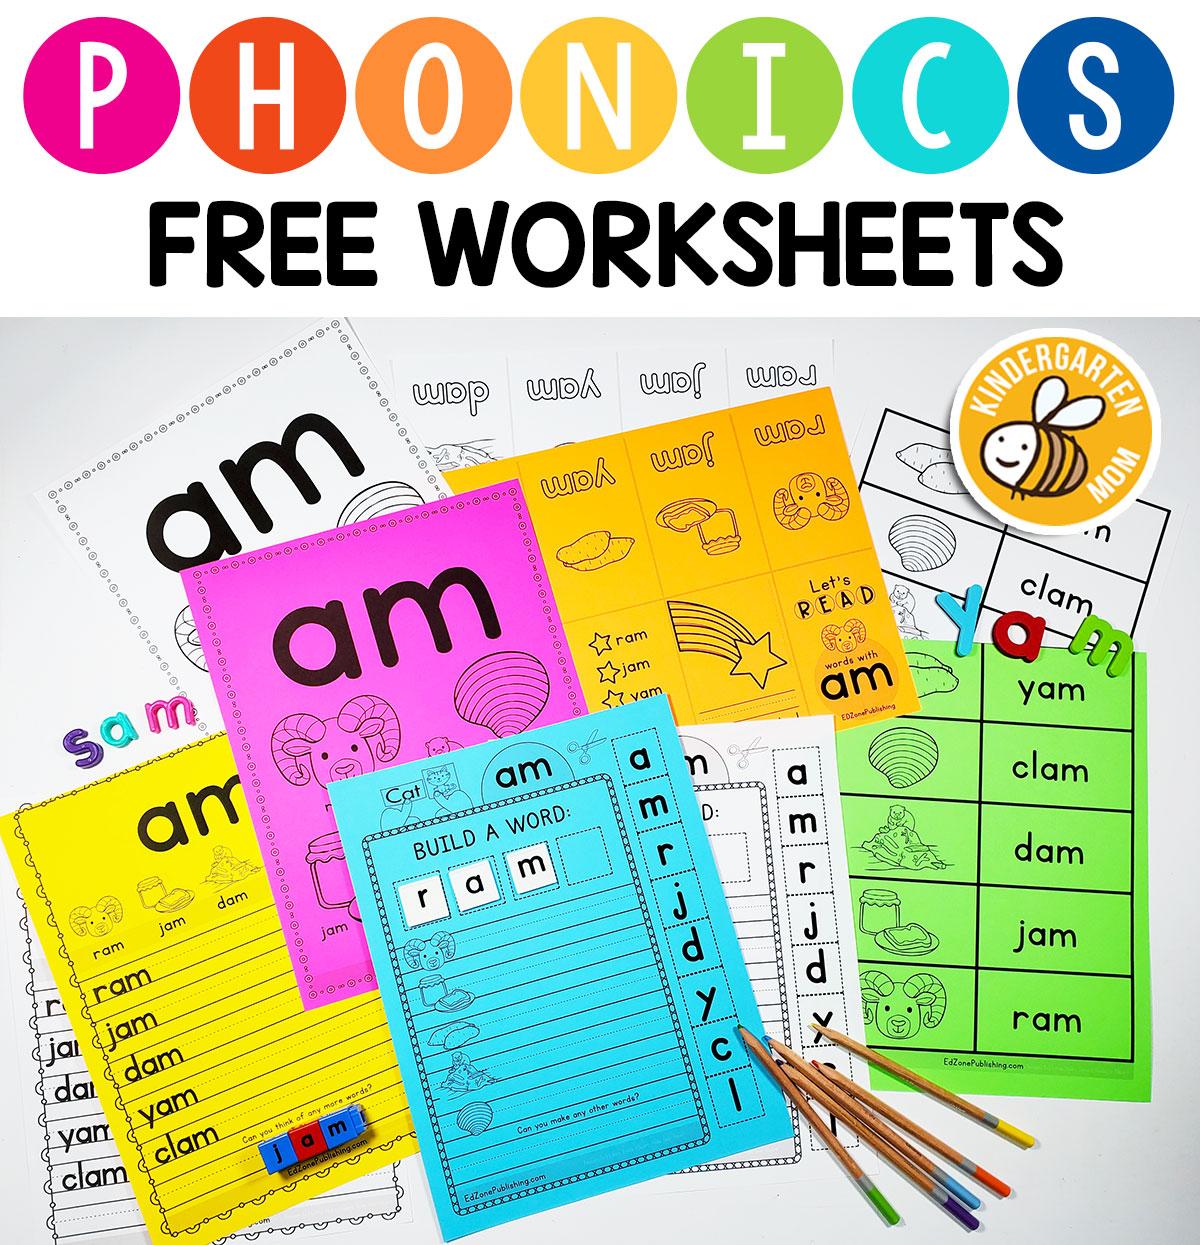 Freephonicsworksheet